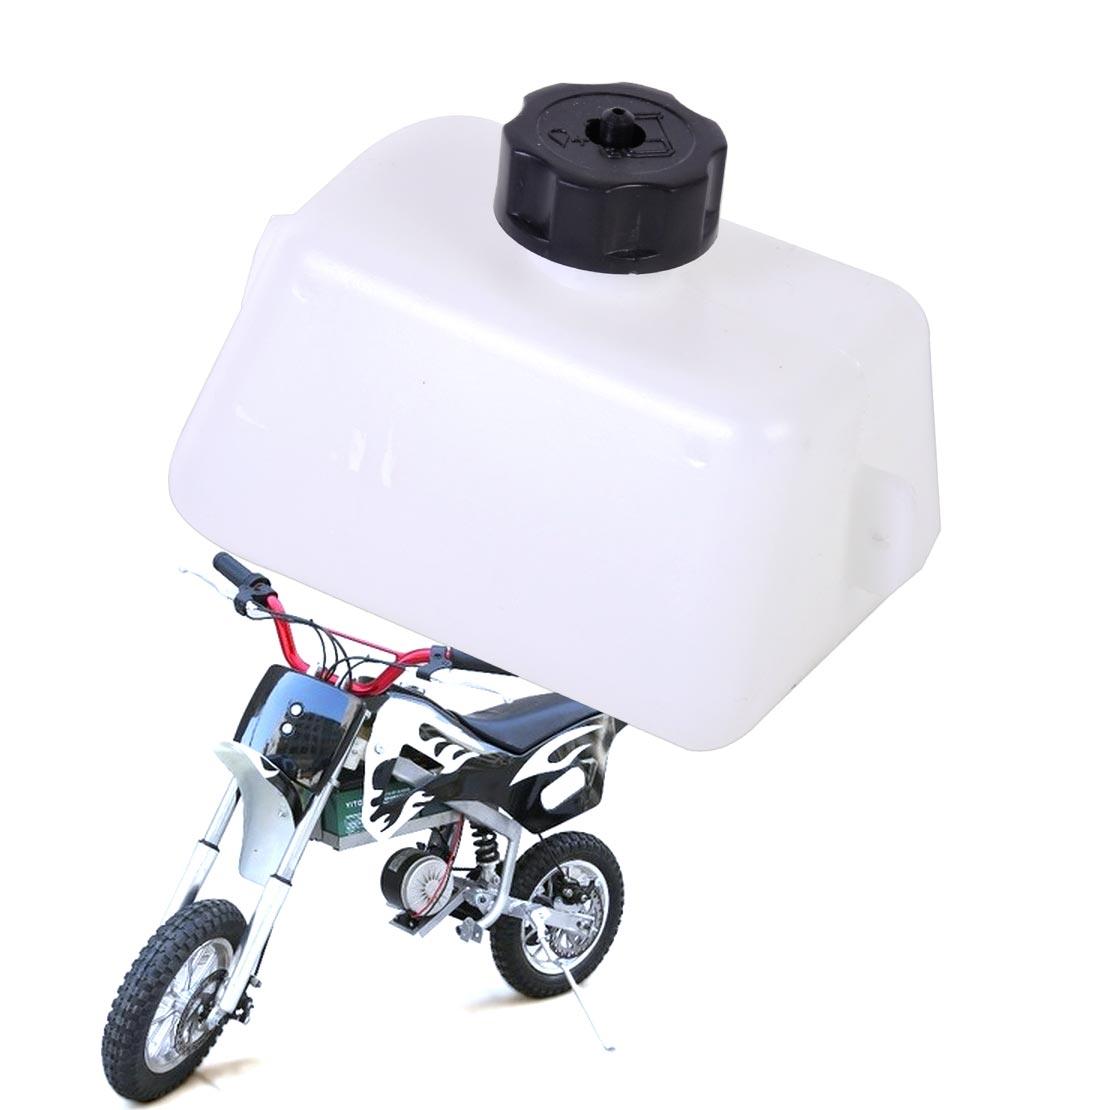 Dwcx gas fuel tank oiler for gas powered 2 stroke 43cc 47cc 49cc mini atv quad